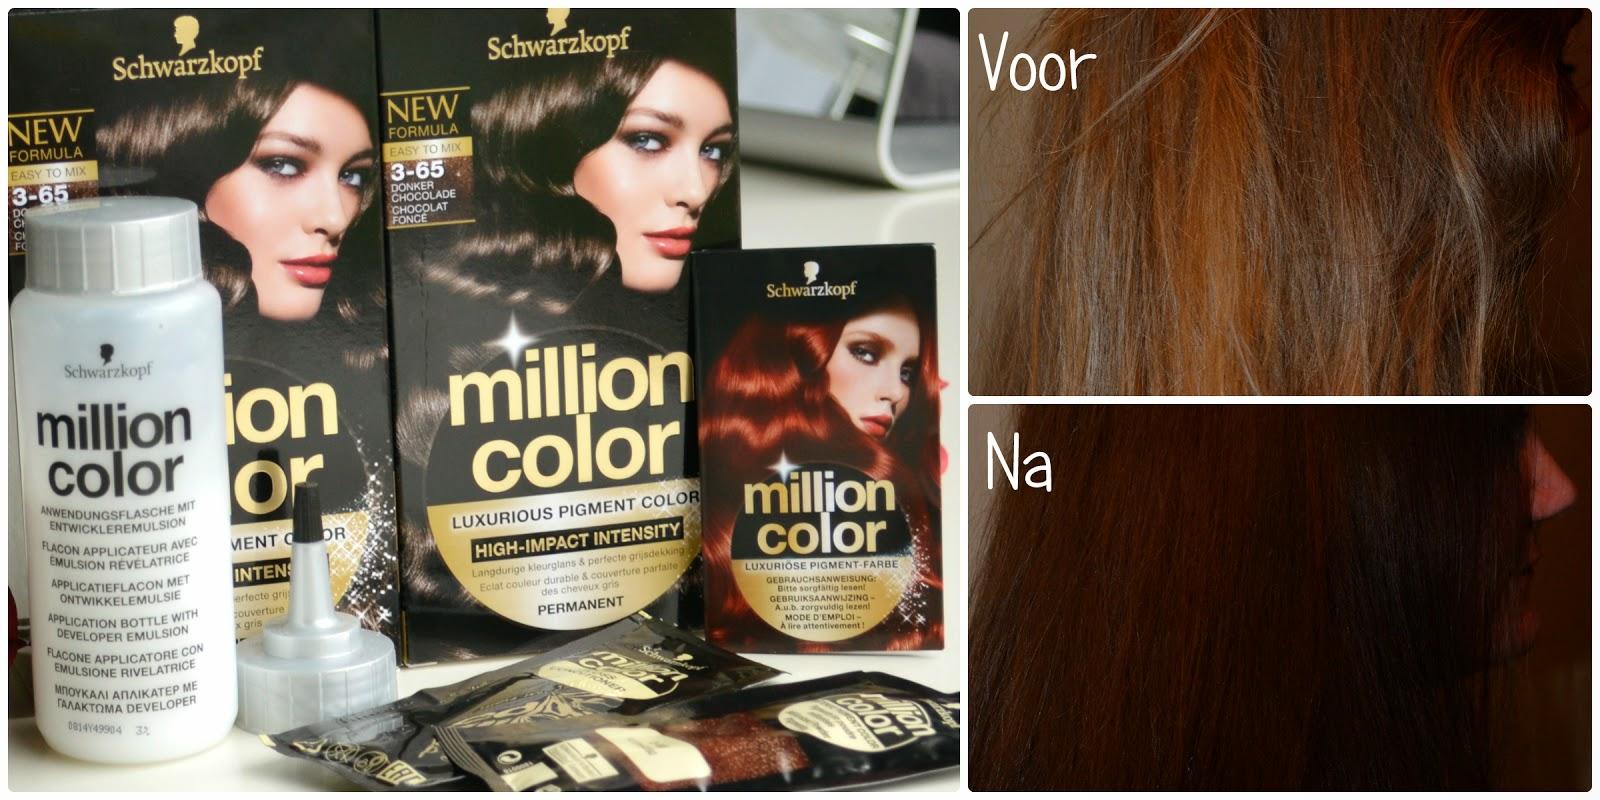 donker lang haar